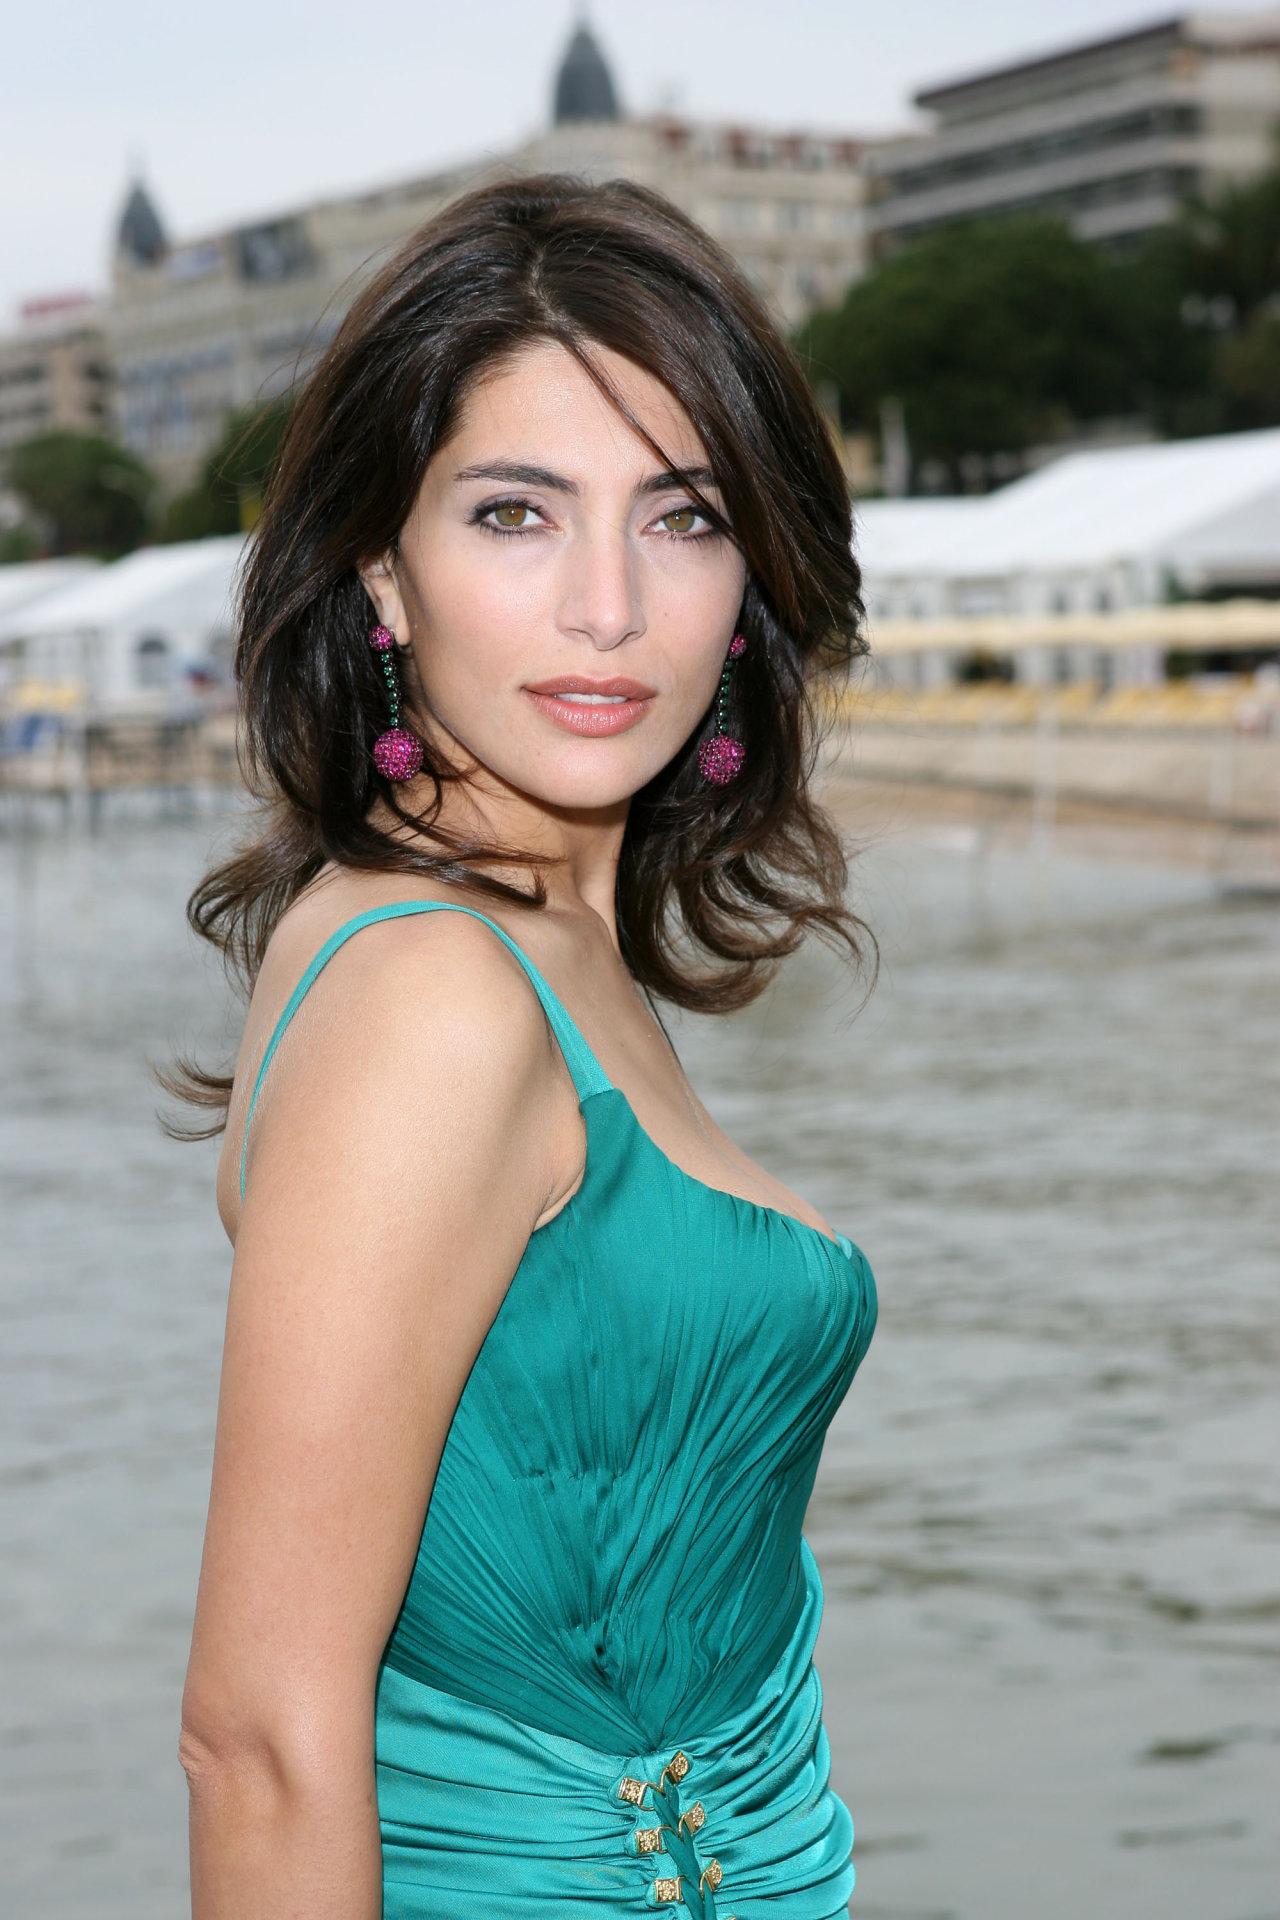 Caterina murino celebrity movie